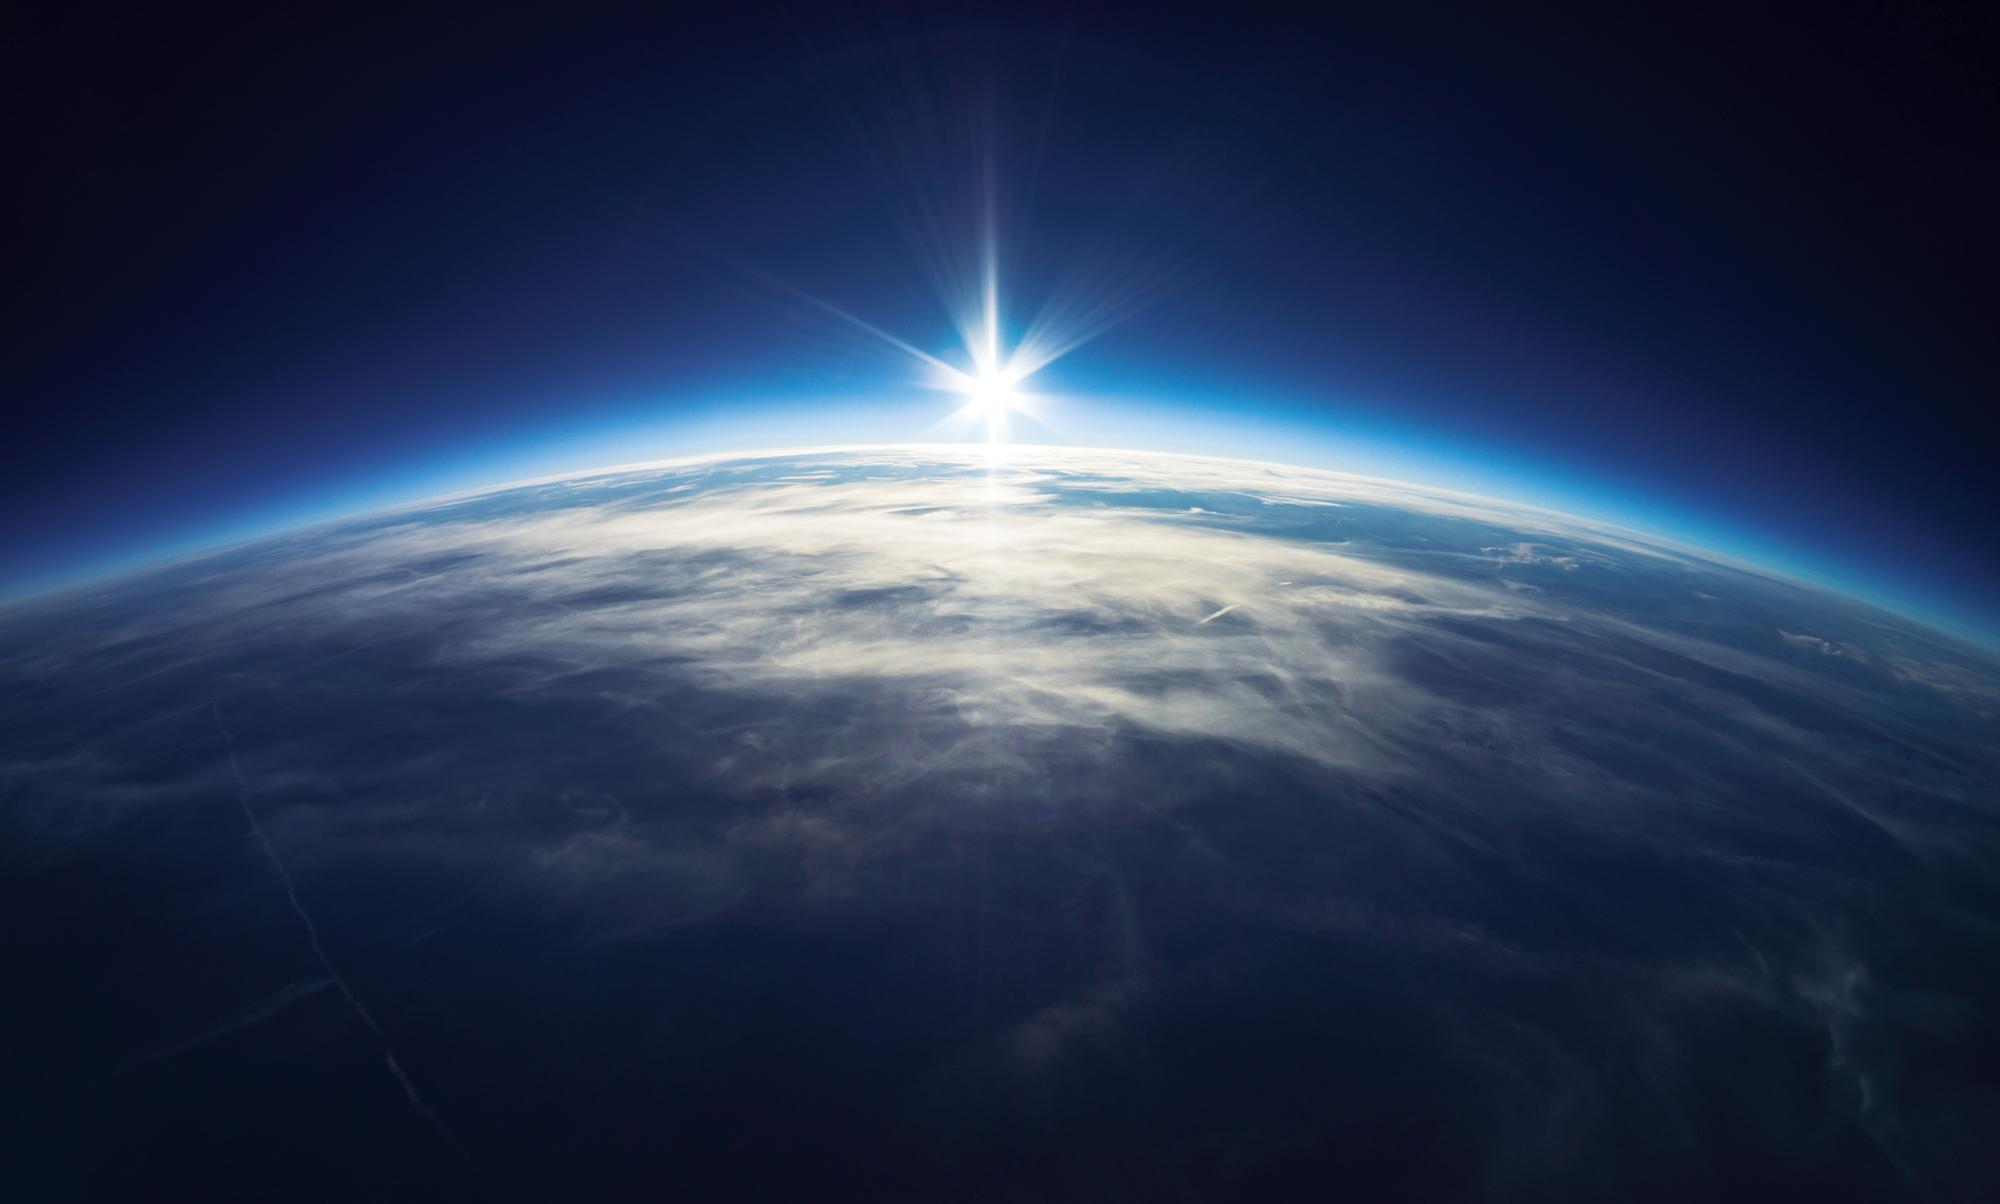 La Hora del Planeta 2020 se vuelve digital